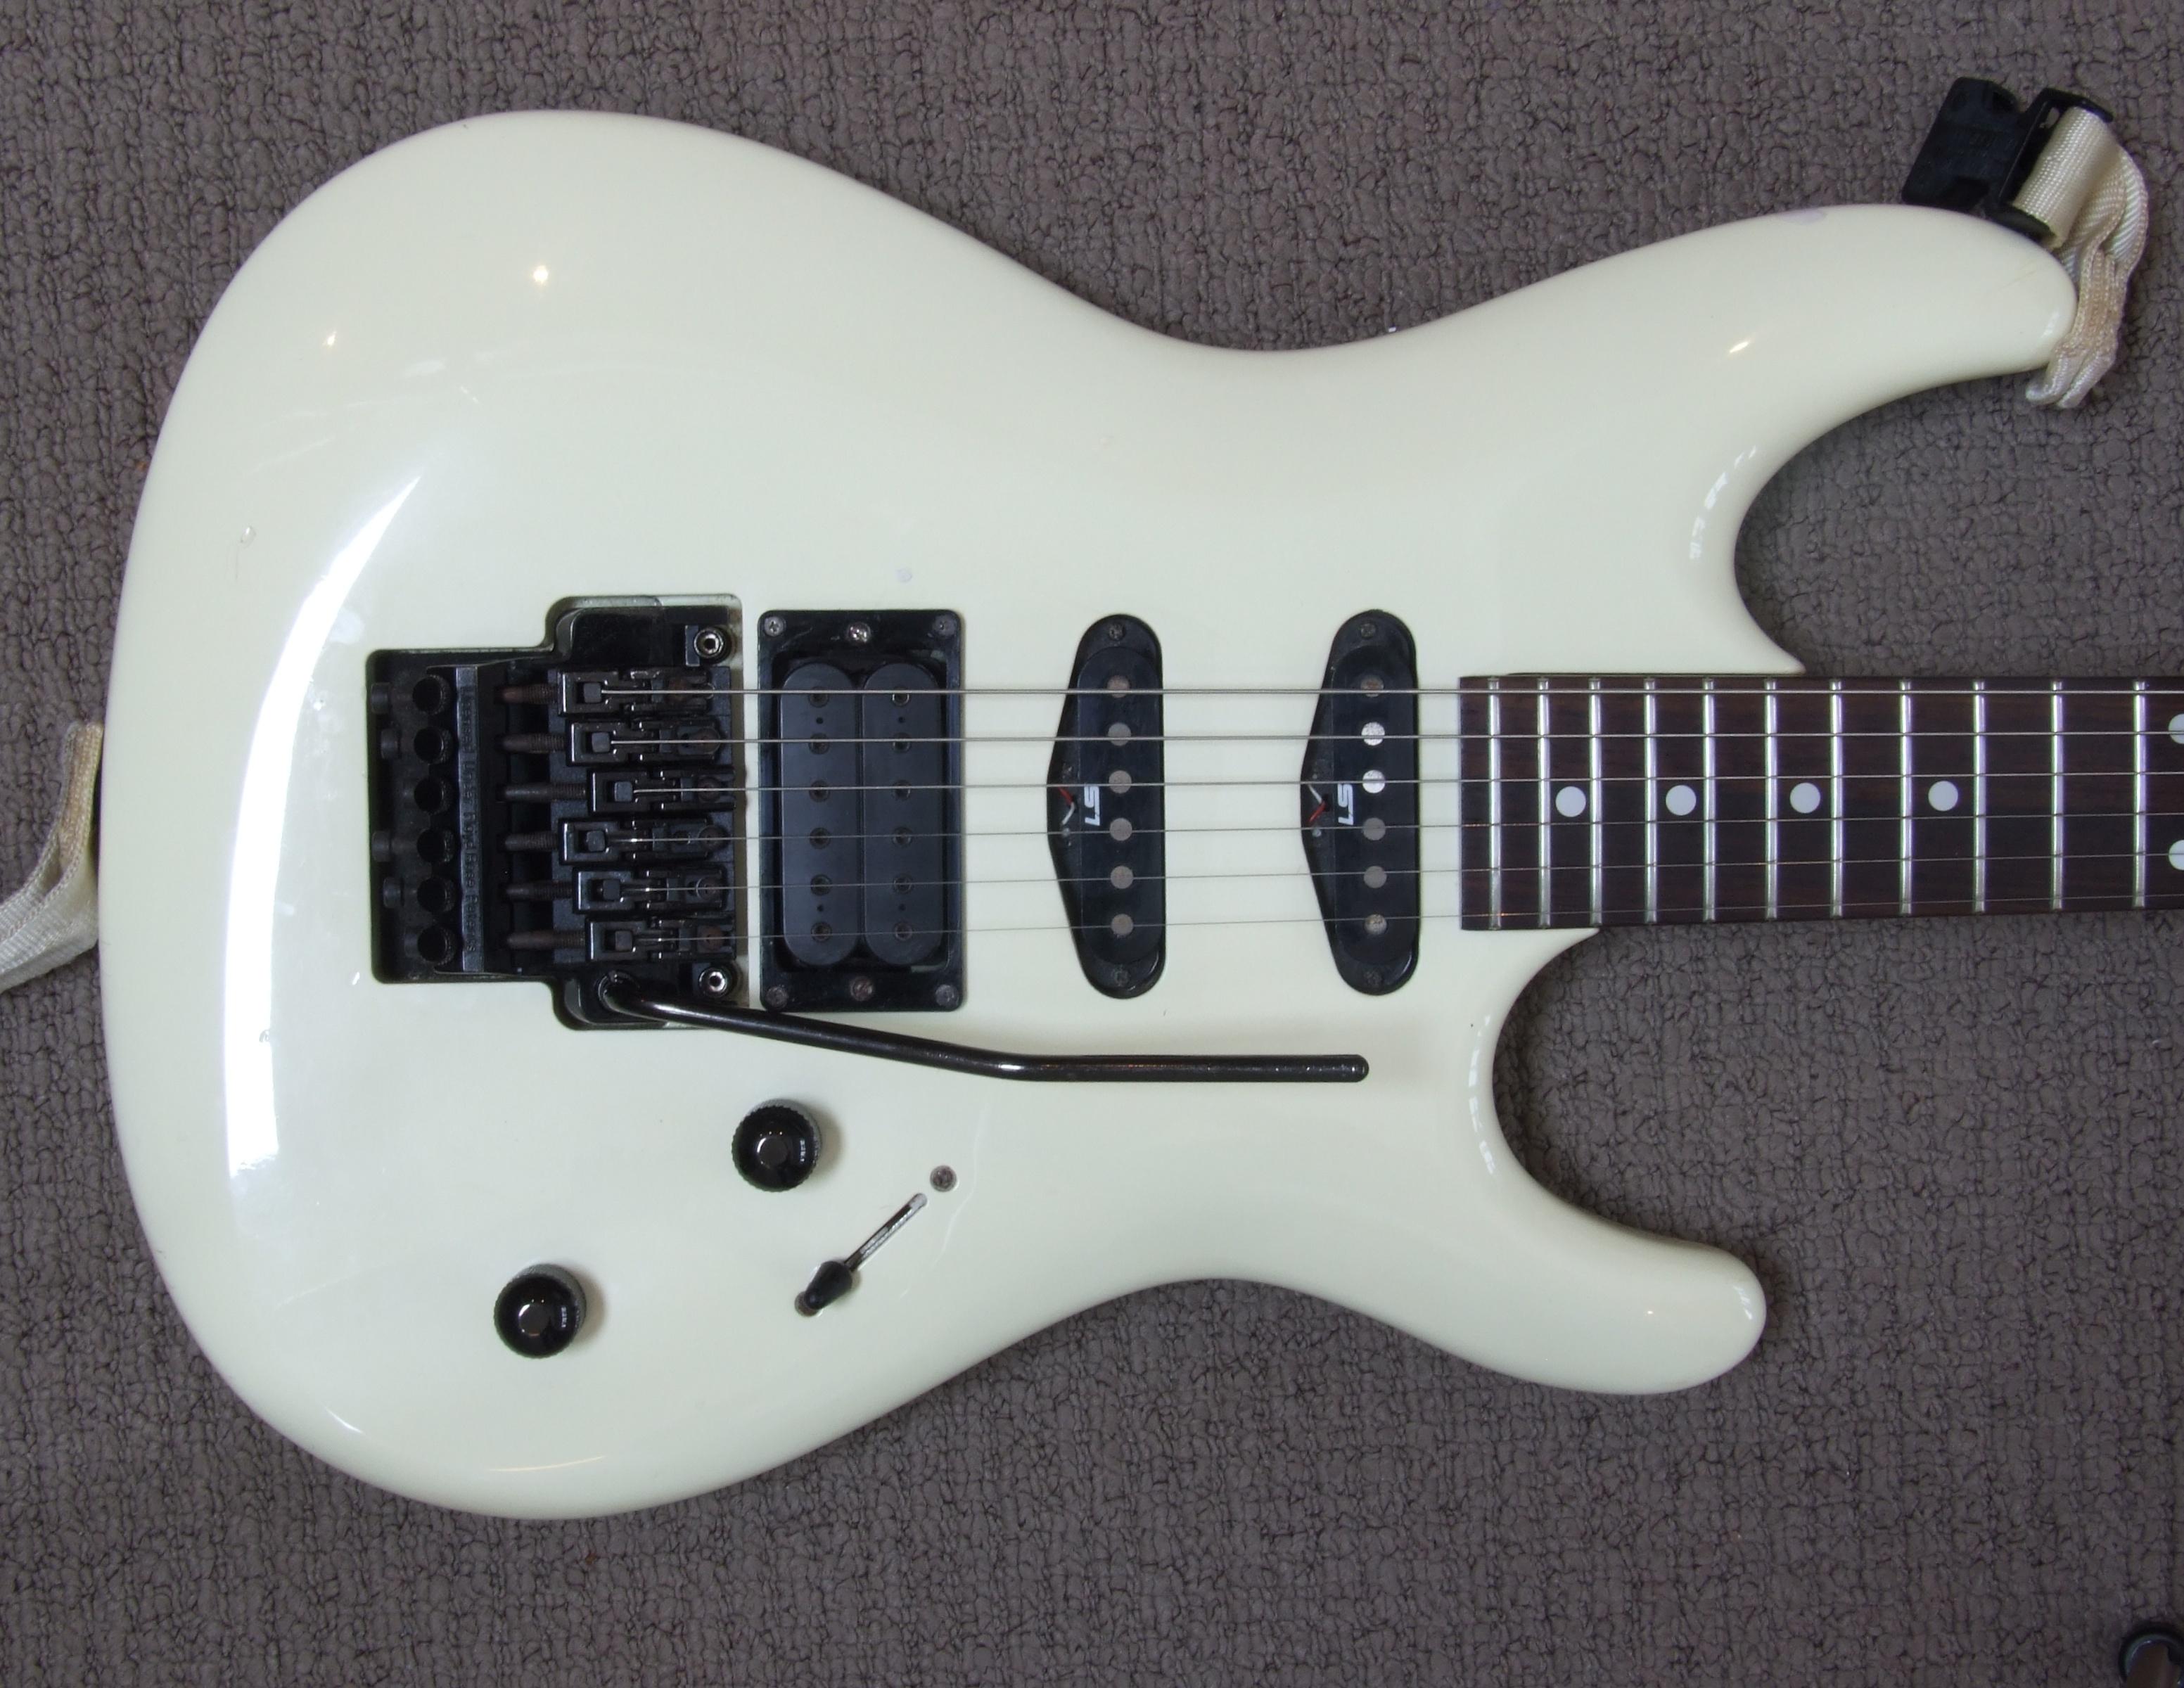 Ibanez 440r 040 Ibanez Guitars Mods And Stuff